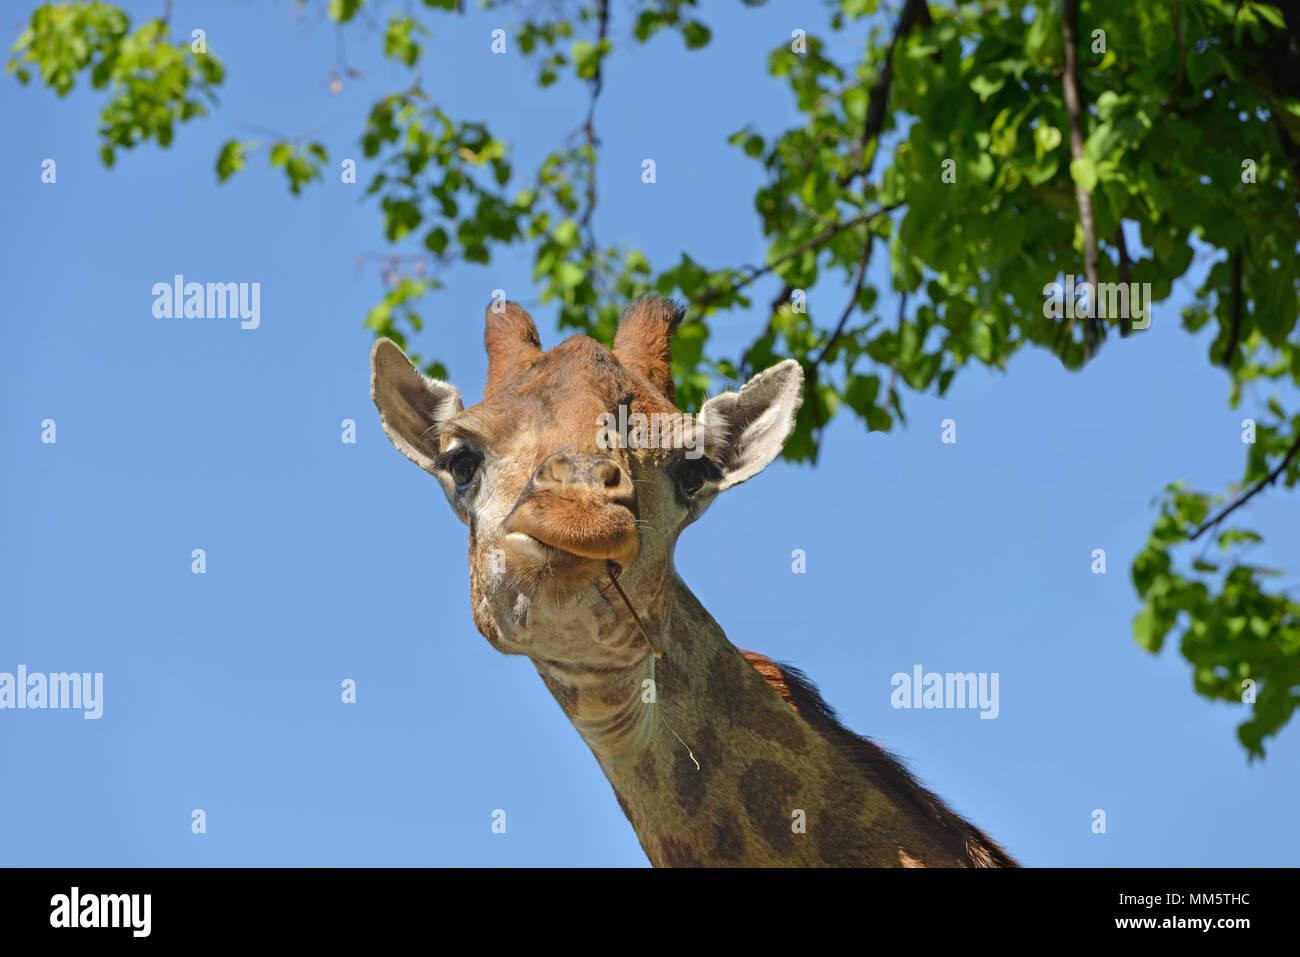 Giraffe (Giraffa camelopardalis giraffa). Portrait - Stock Image